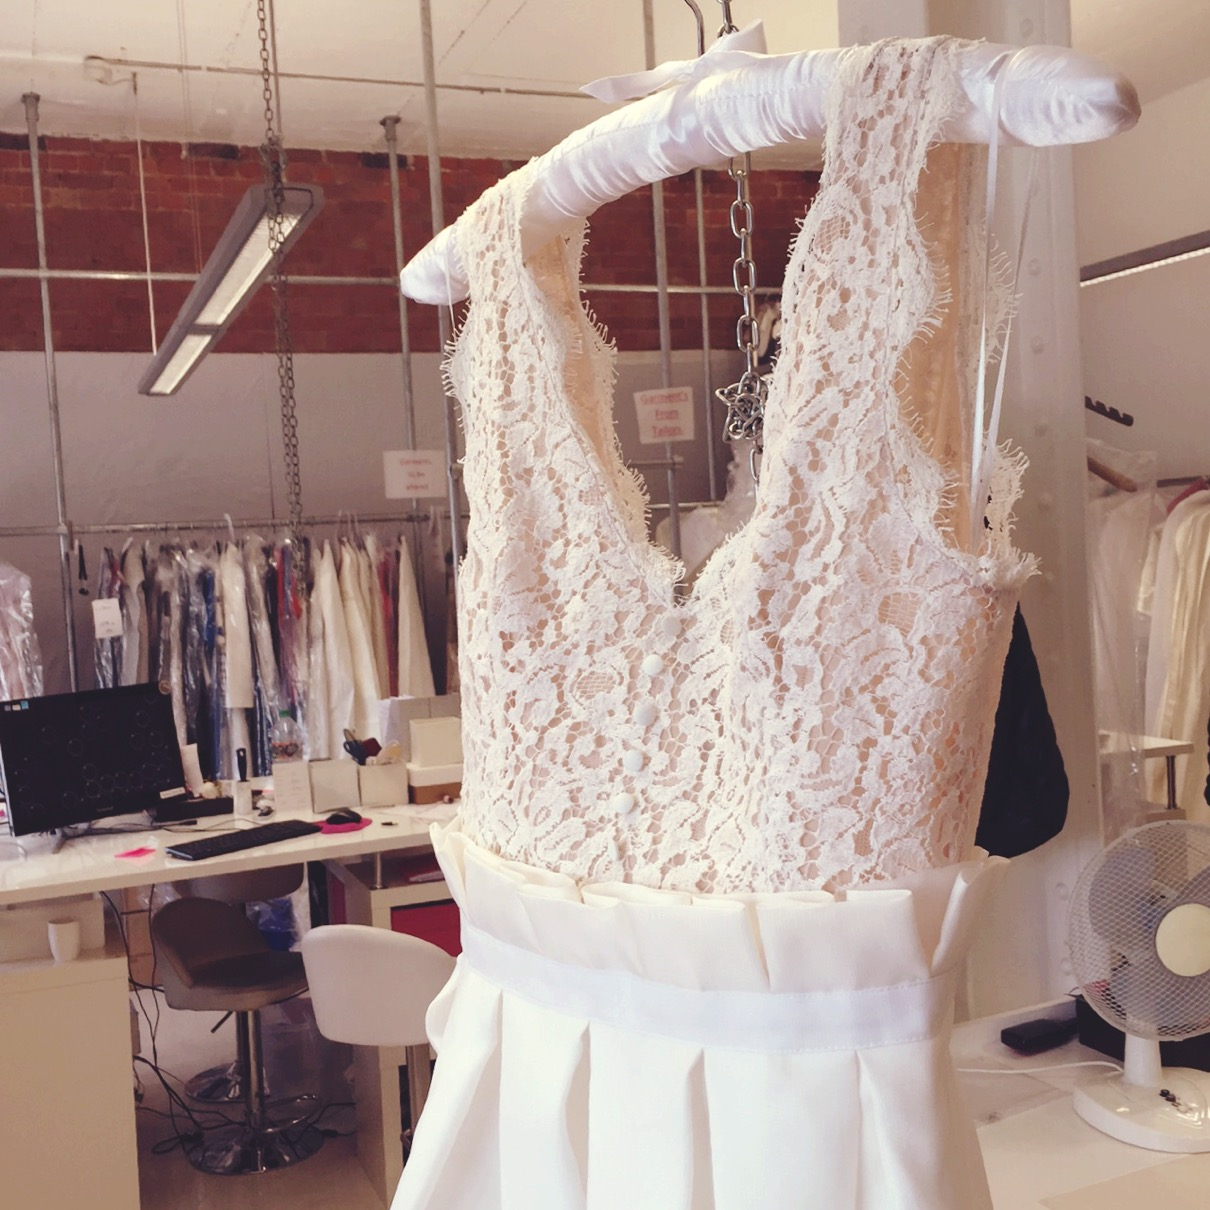 Silk Wedding Dress.JPG